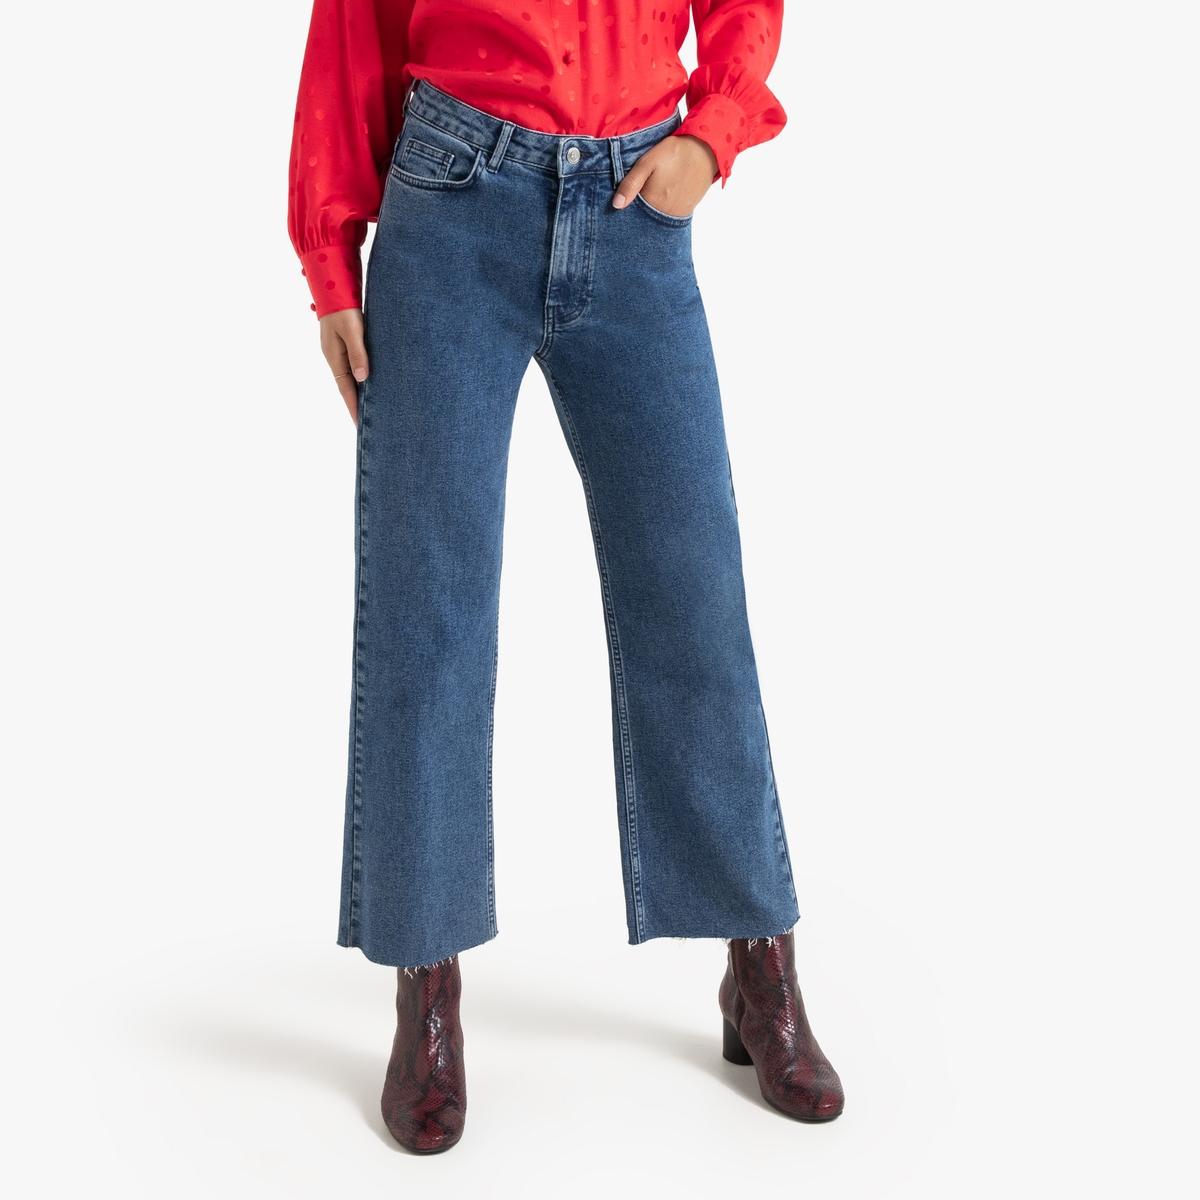 Falda pantalón denim